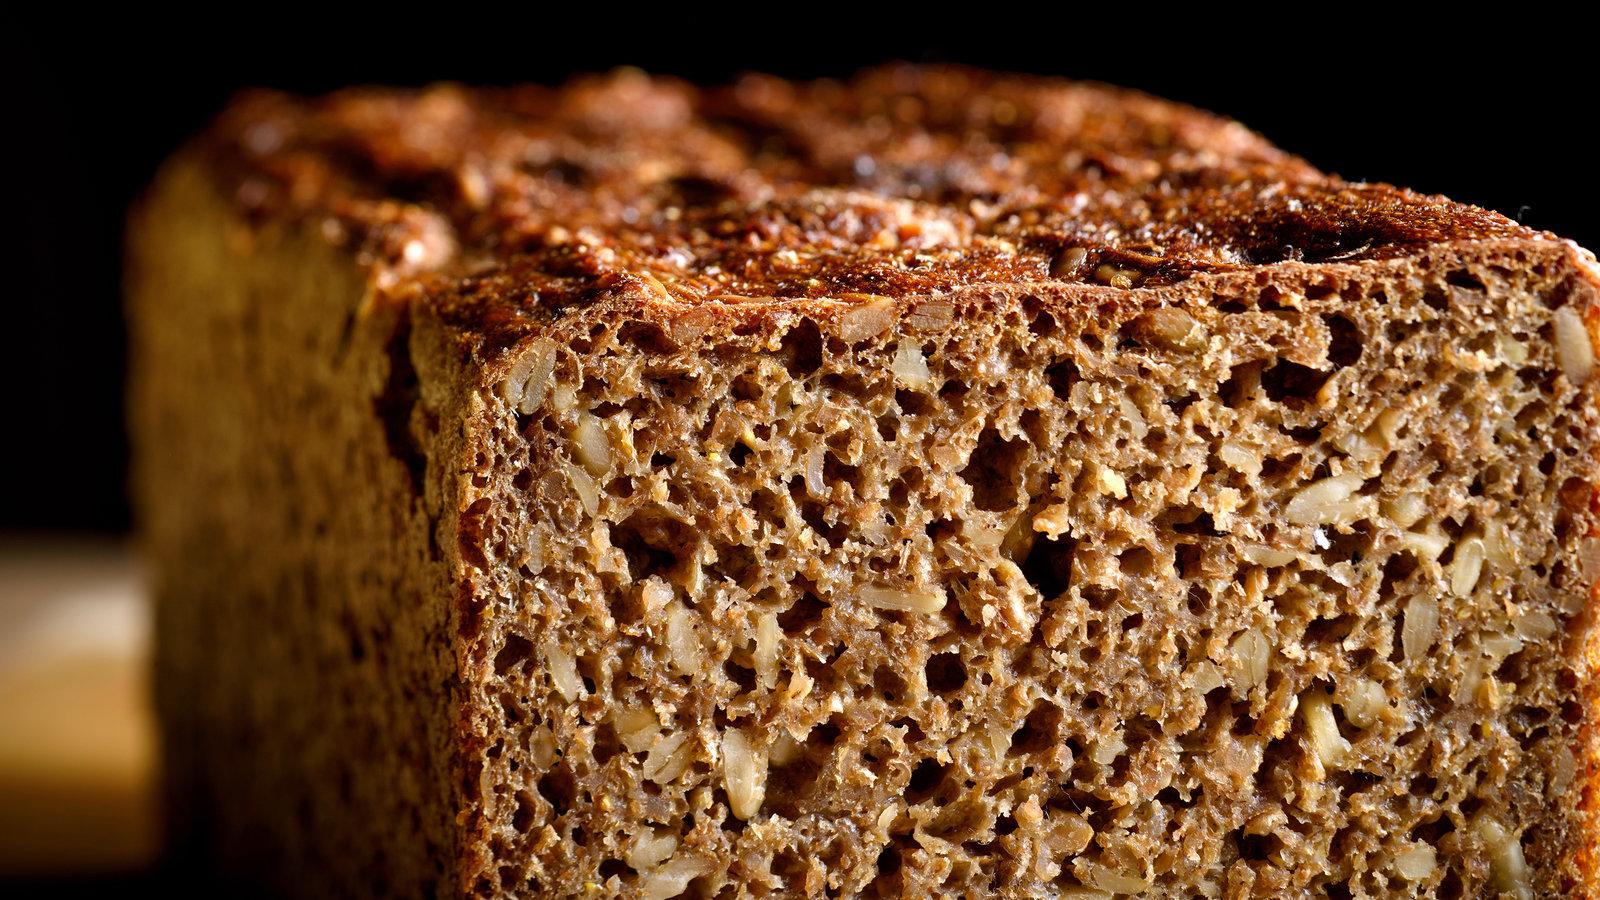 Nordic WholeGrain Rye Bread Recipe  KeepRecipes Your Universal Recipe Box